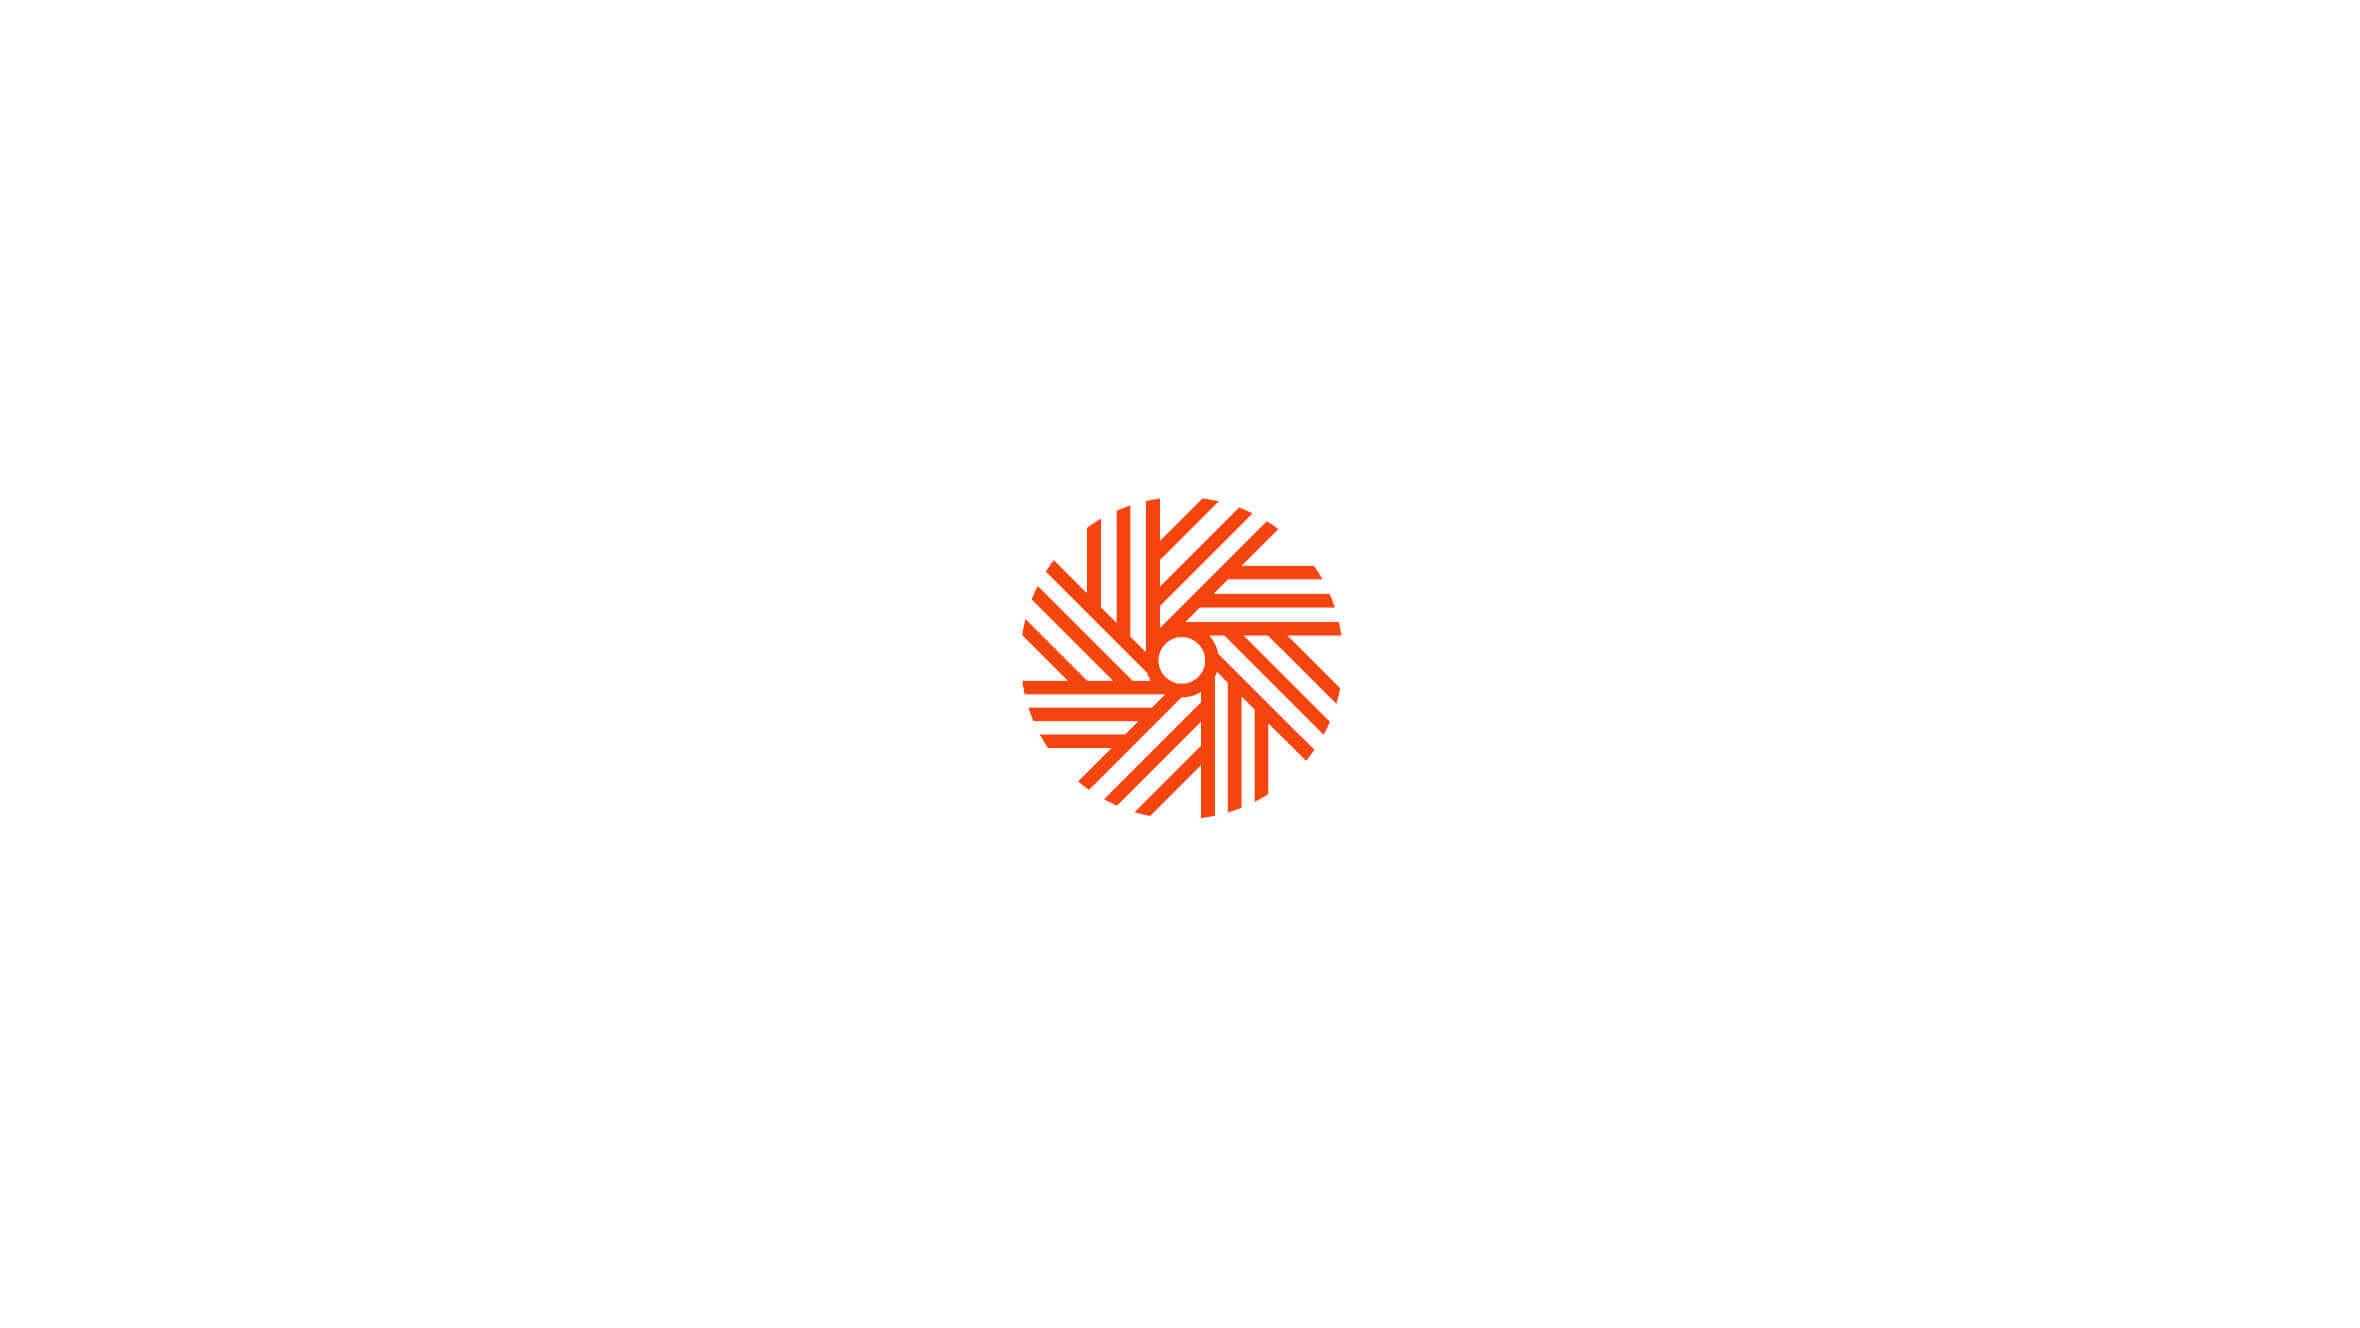 OCV-ODC-universidade-coruna-logo